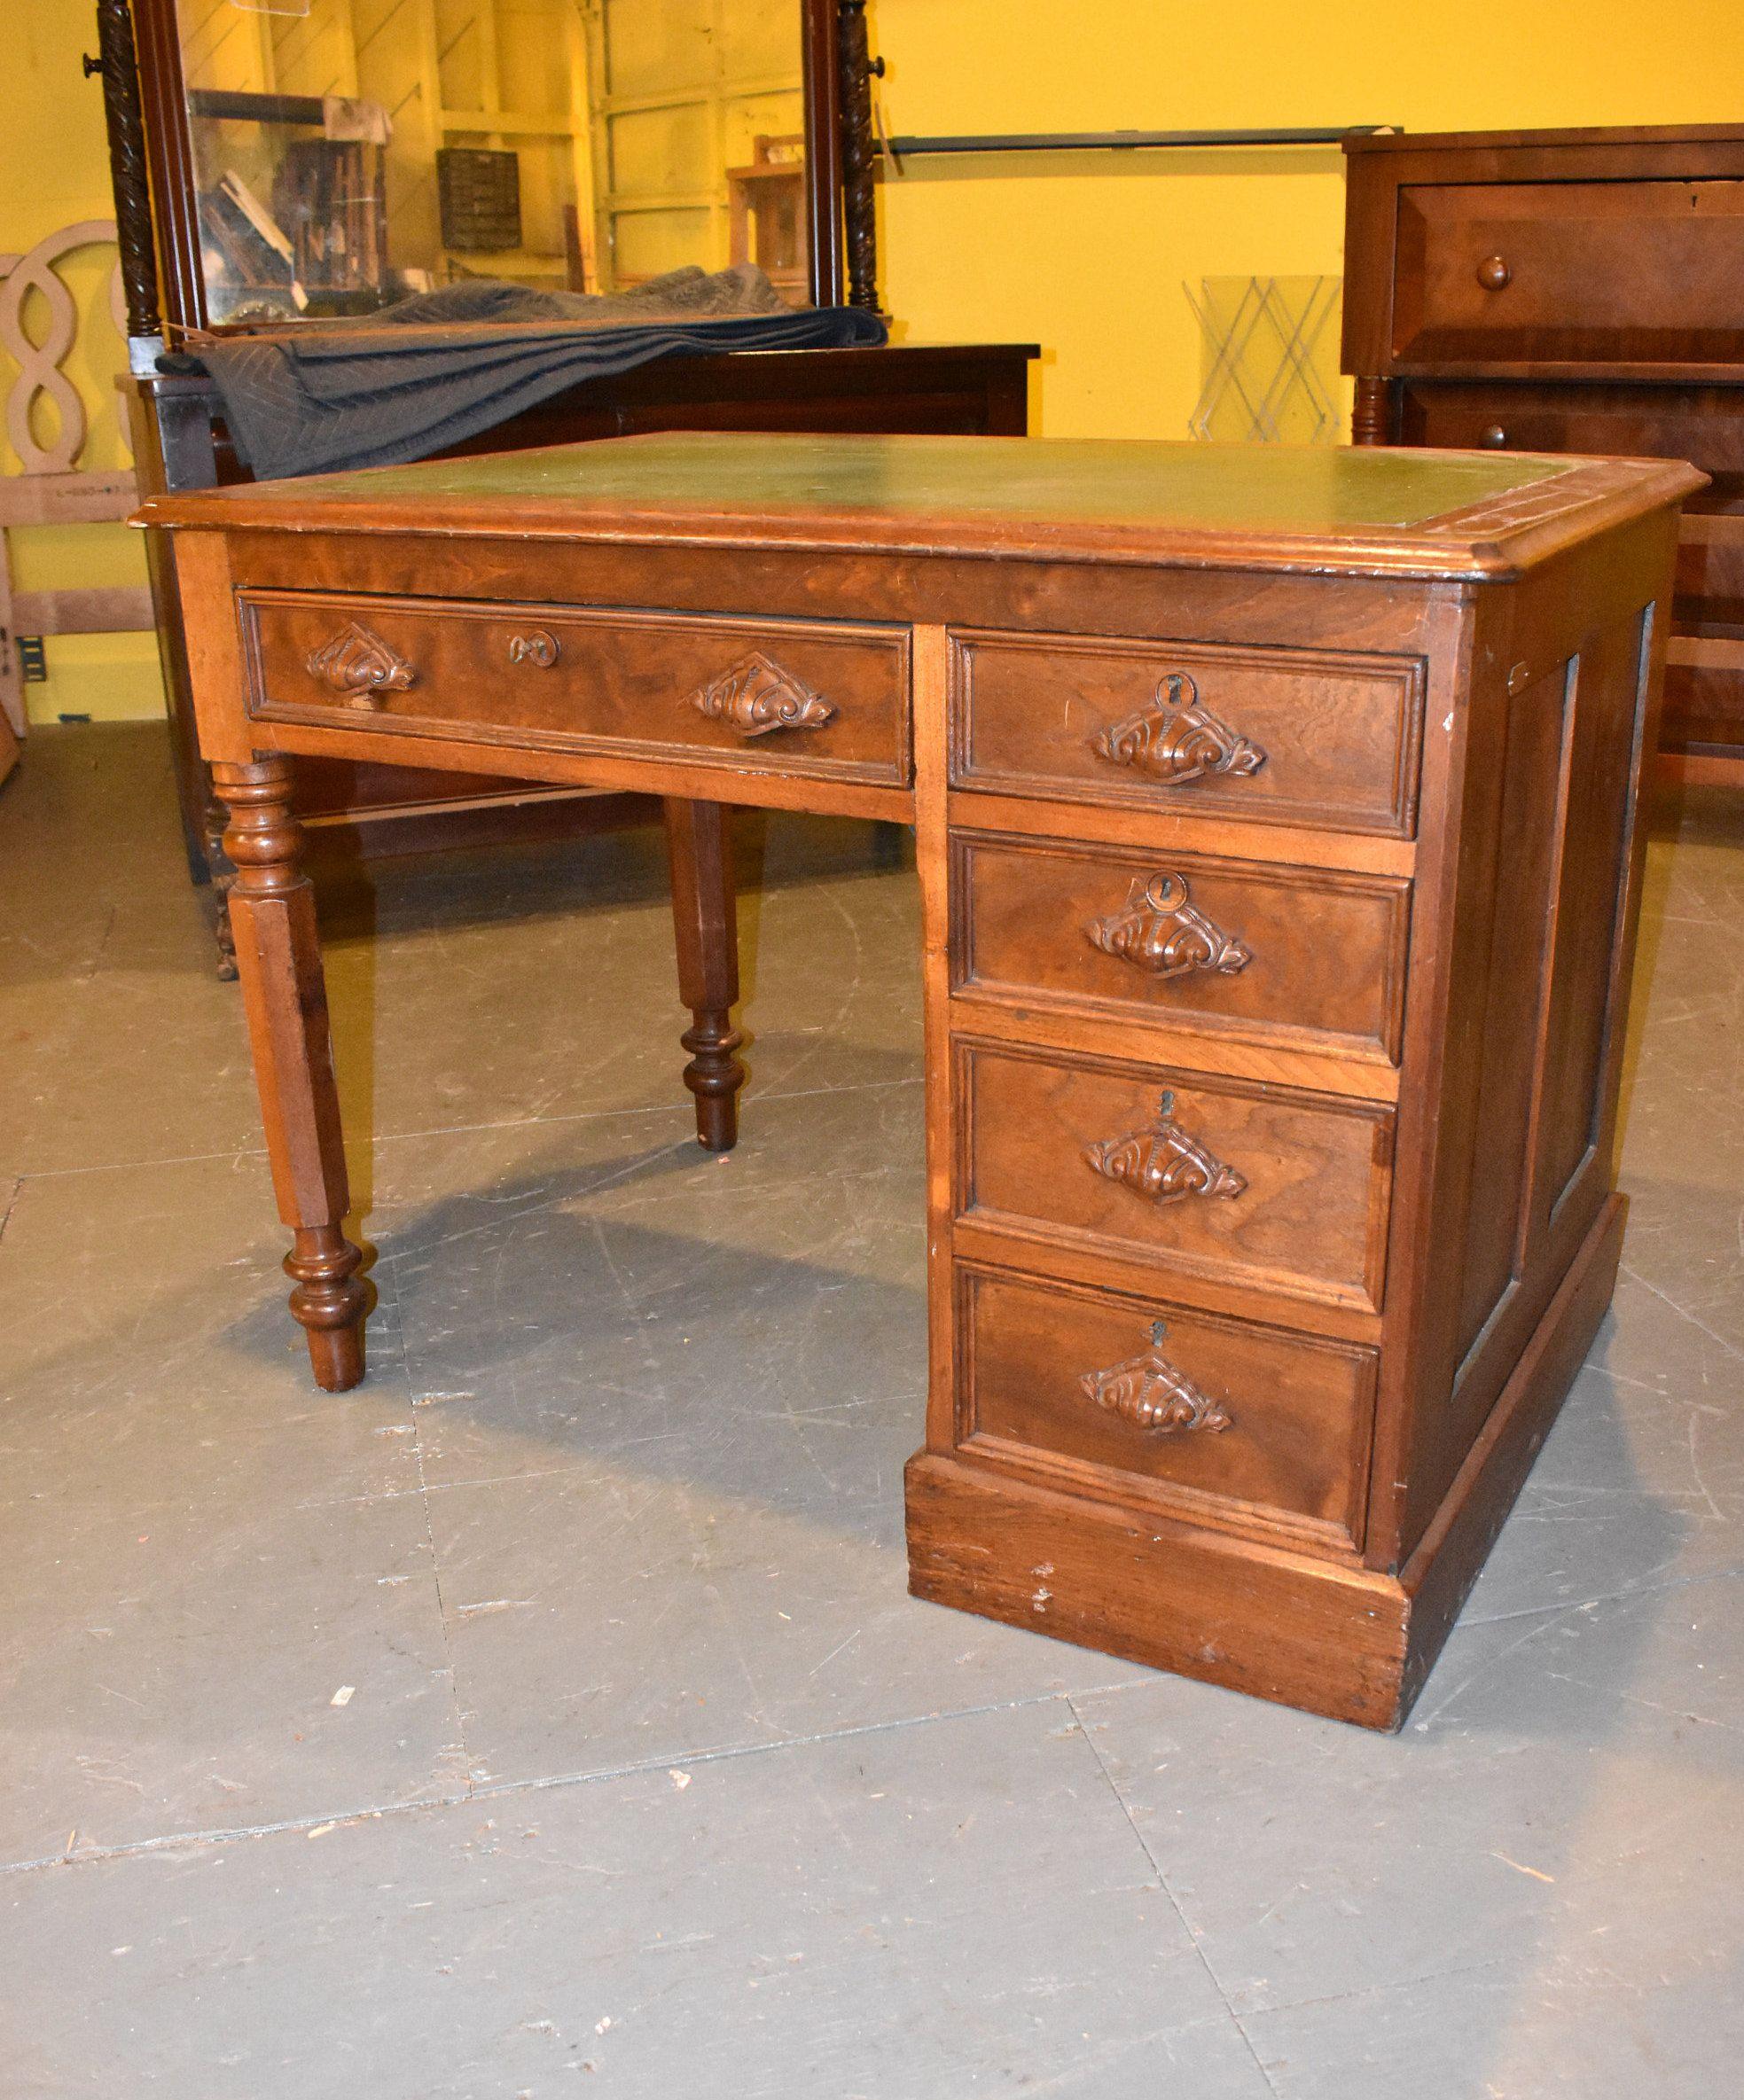 Antique Oak Leather Top Kneehole Vintage Desk by